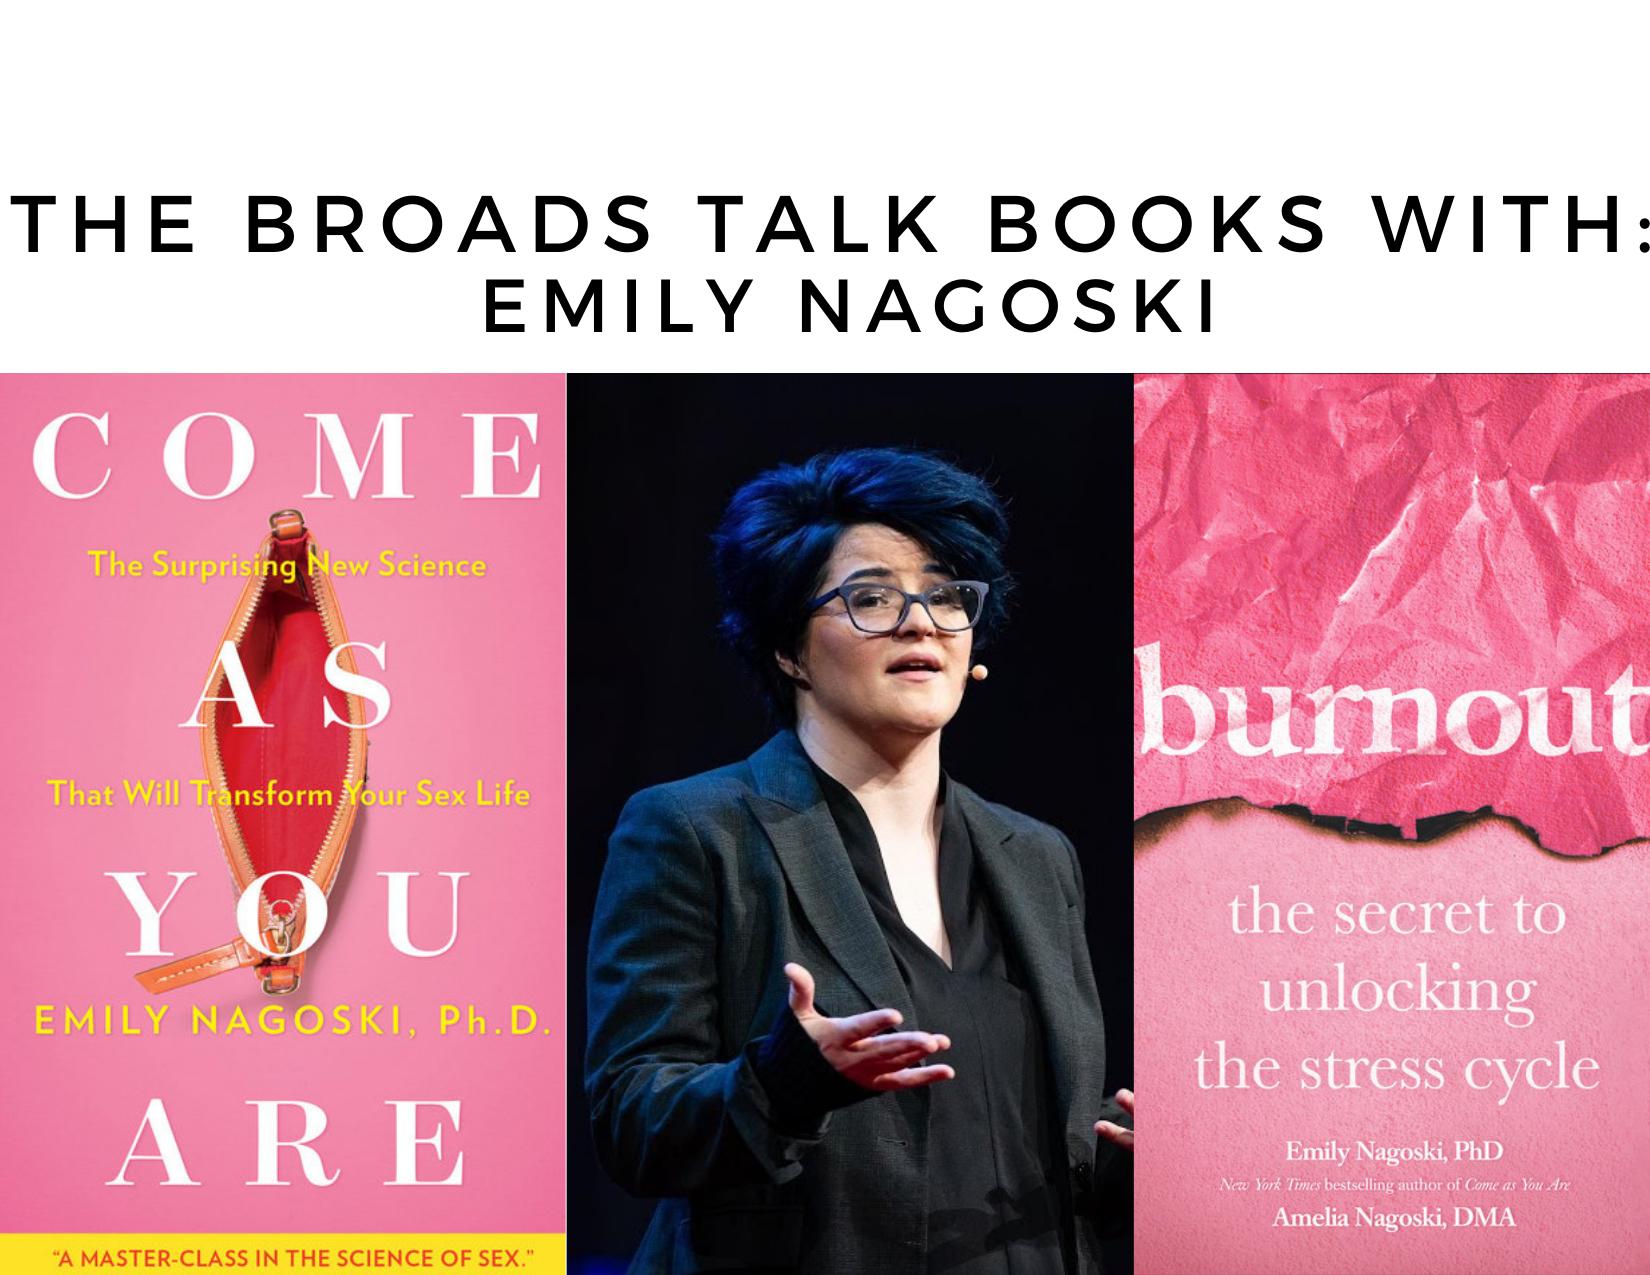 The Broads Talk Books With Emily Nagoski